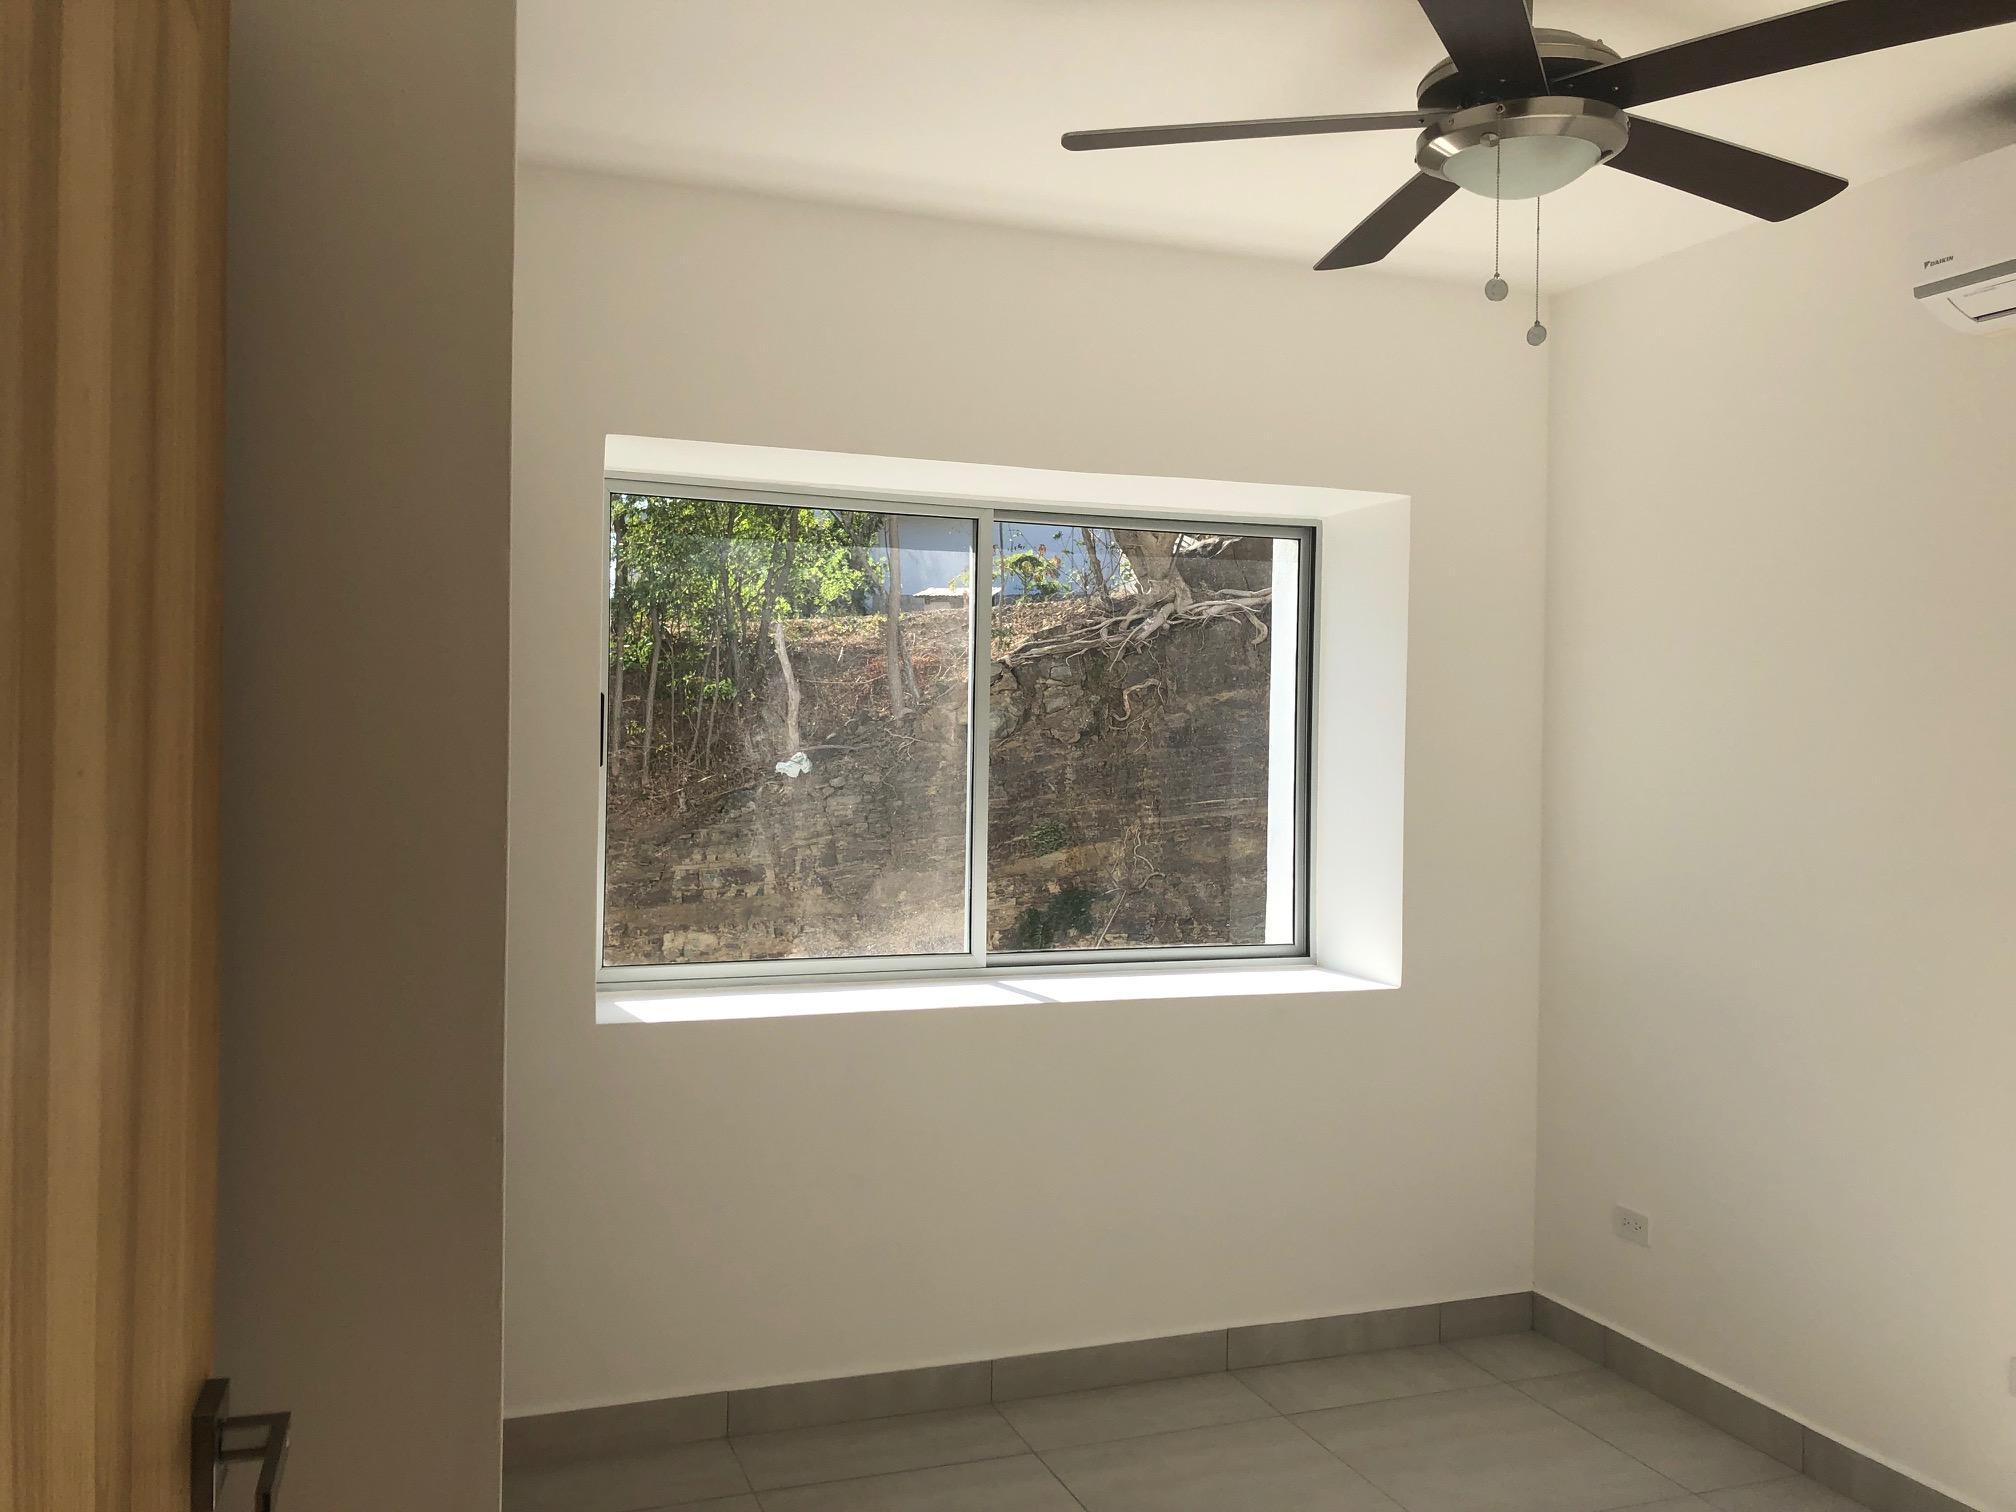 Real Estate For Nicaragua 10.jpg